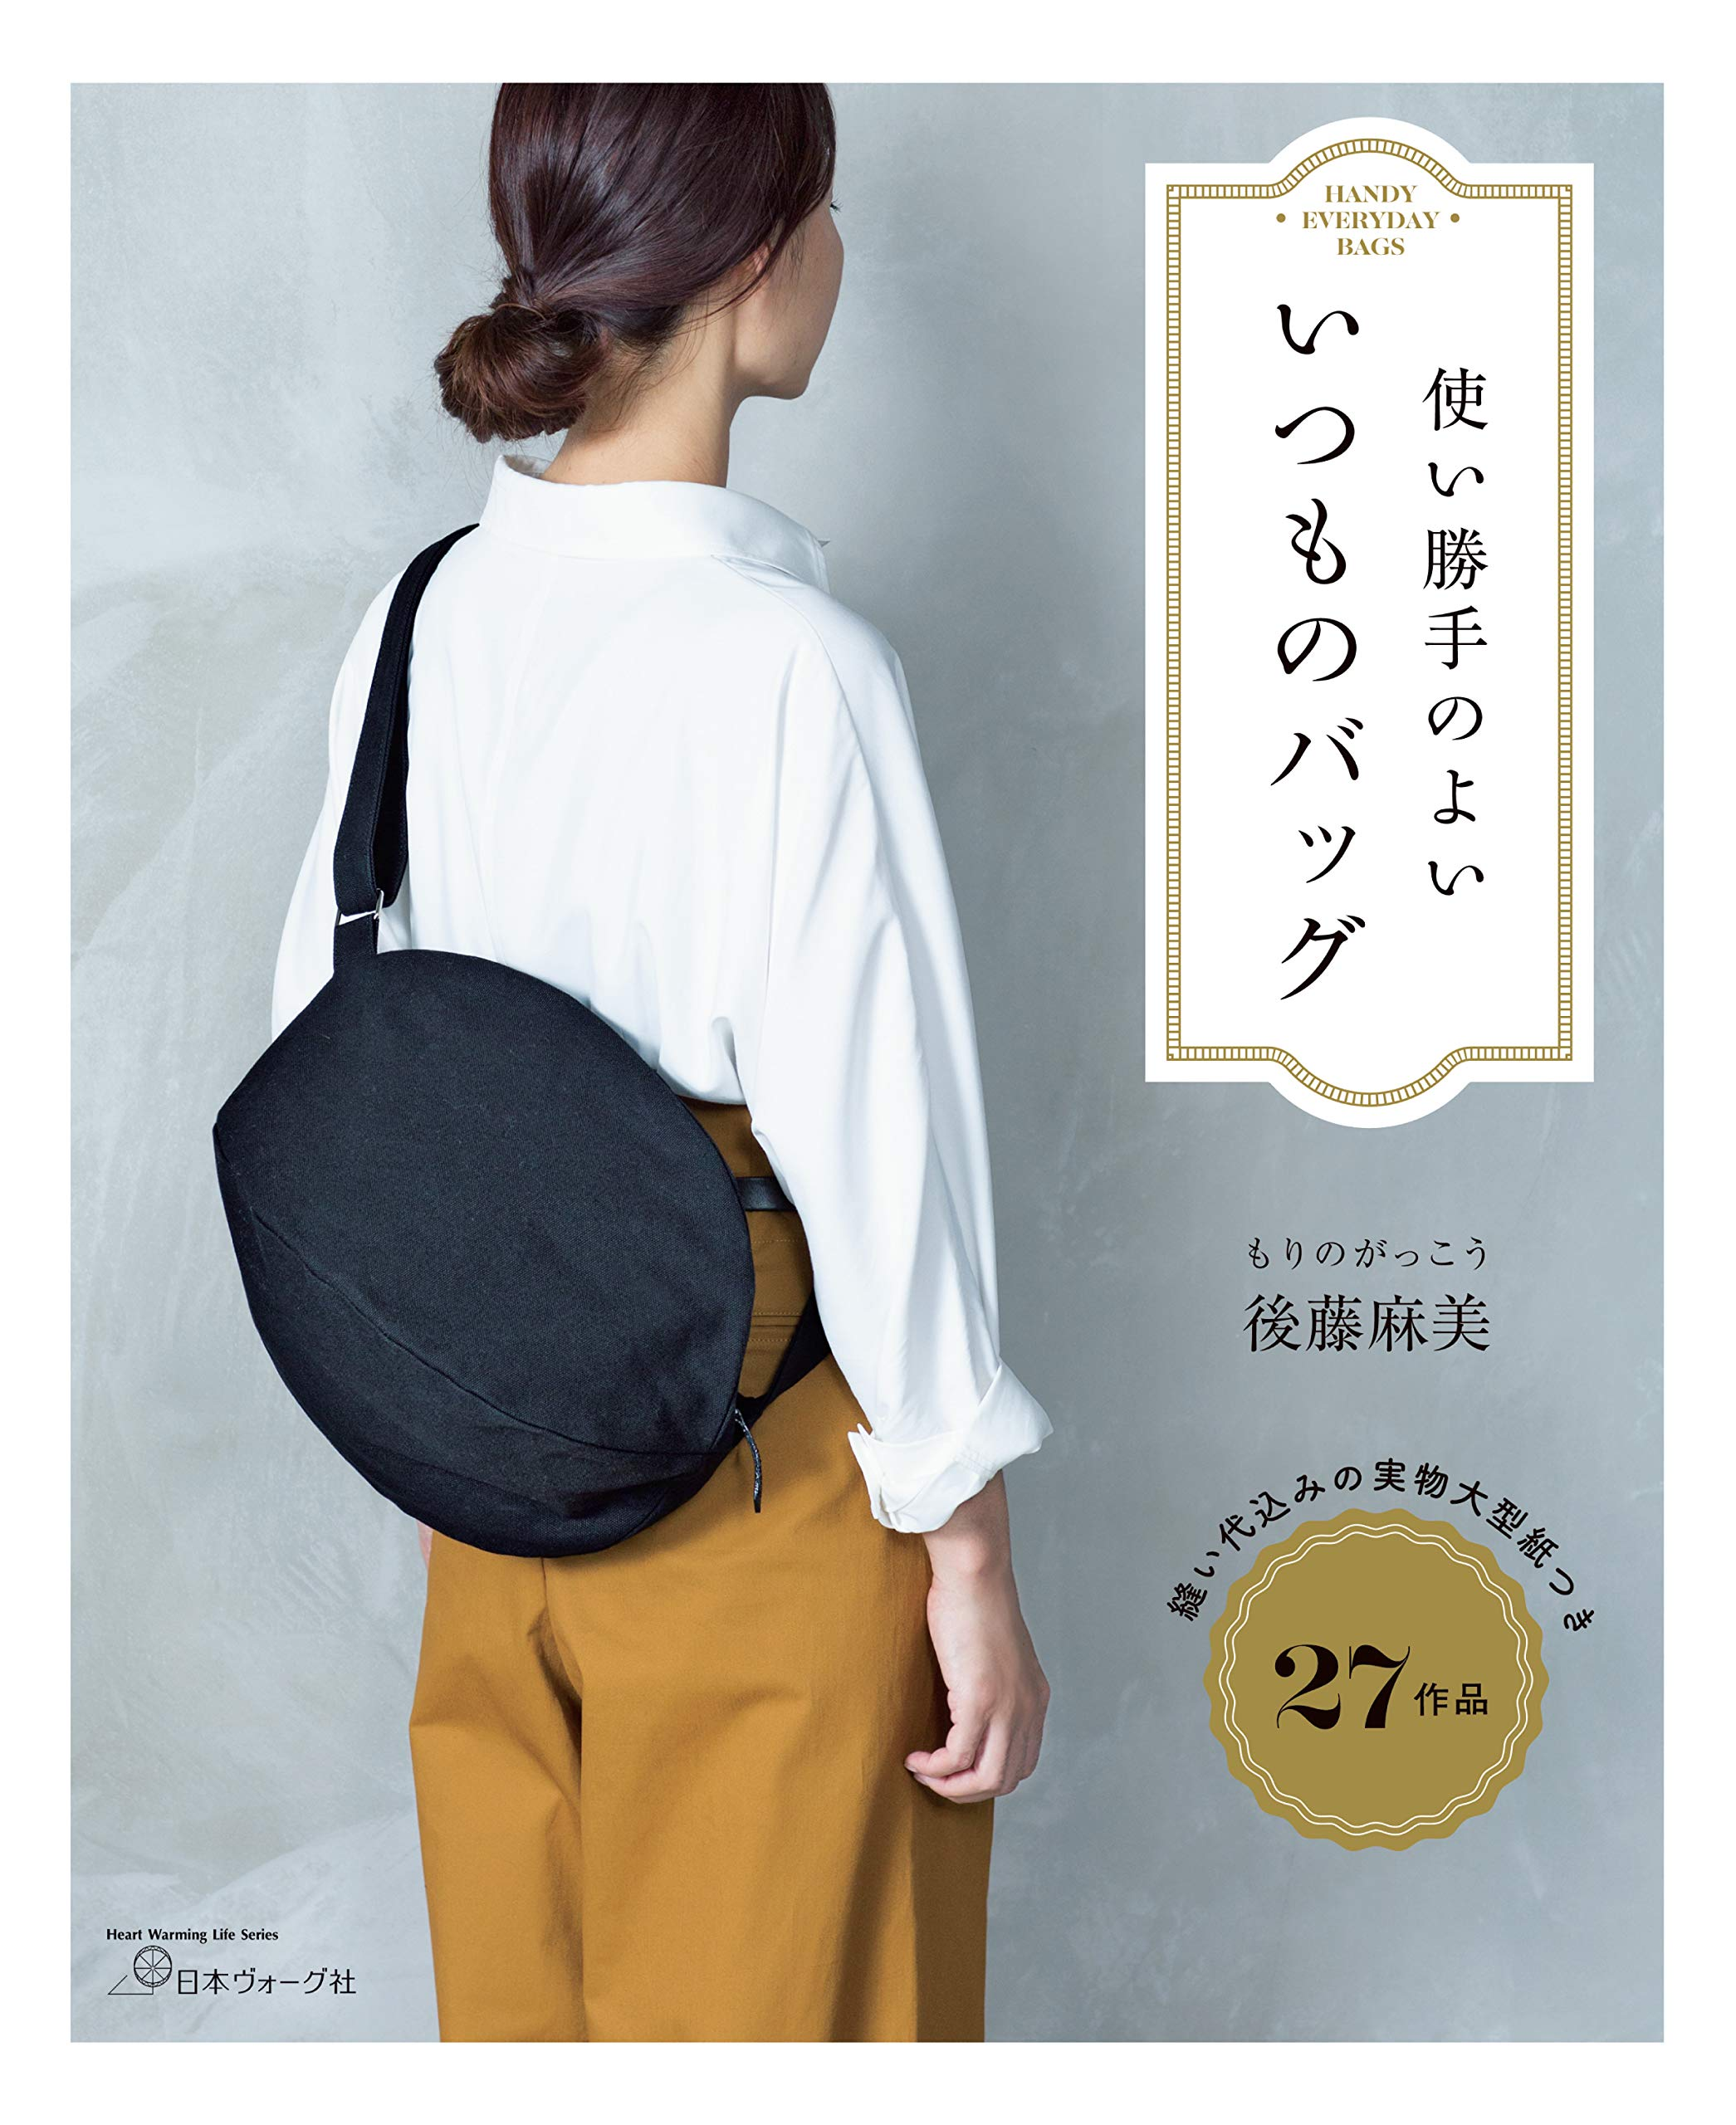 Usual bag